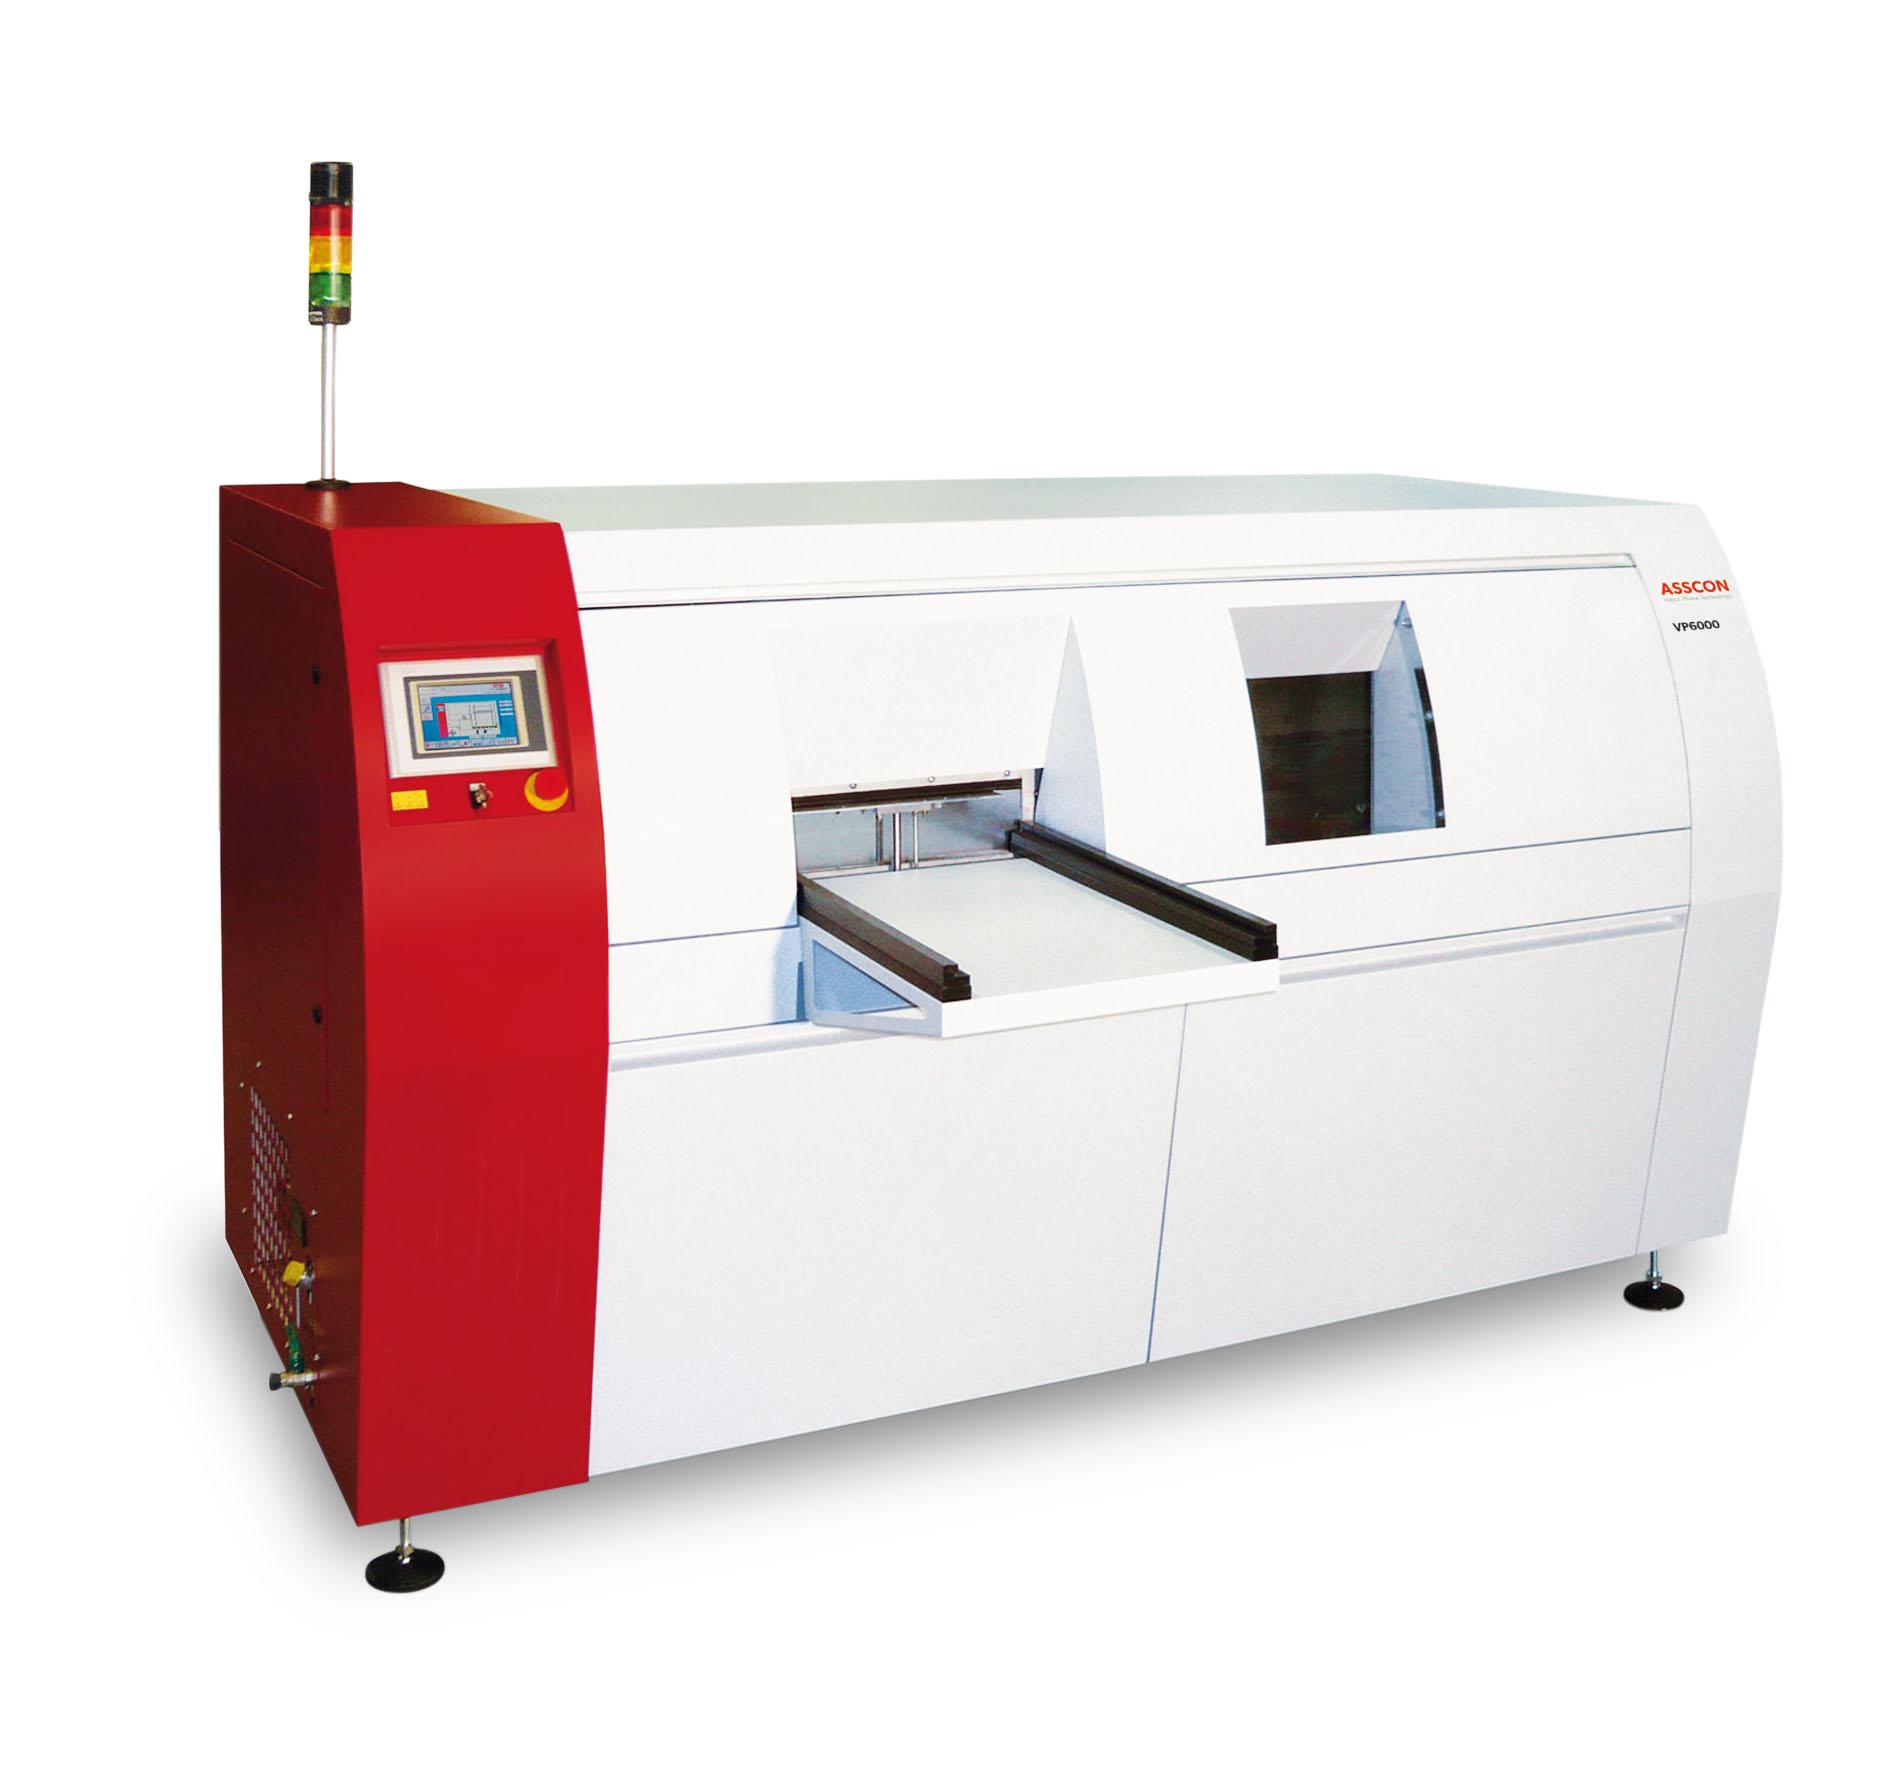 Höyryfaasi VP6000 Vacuum